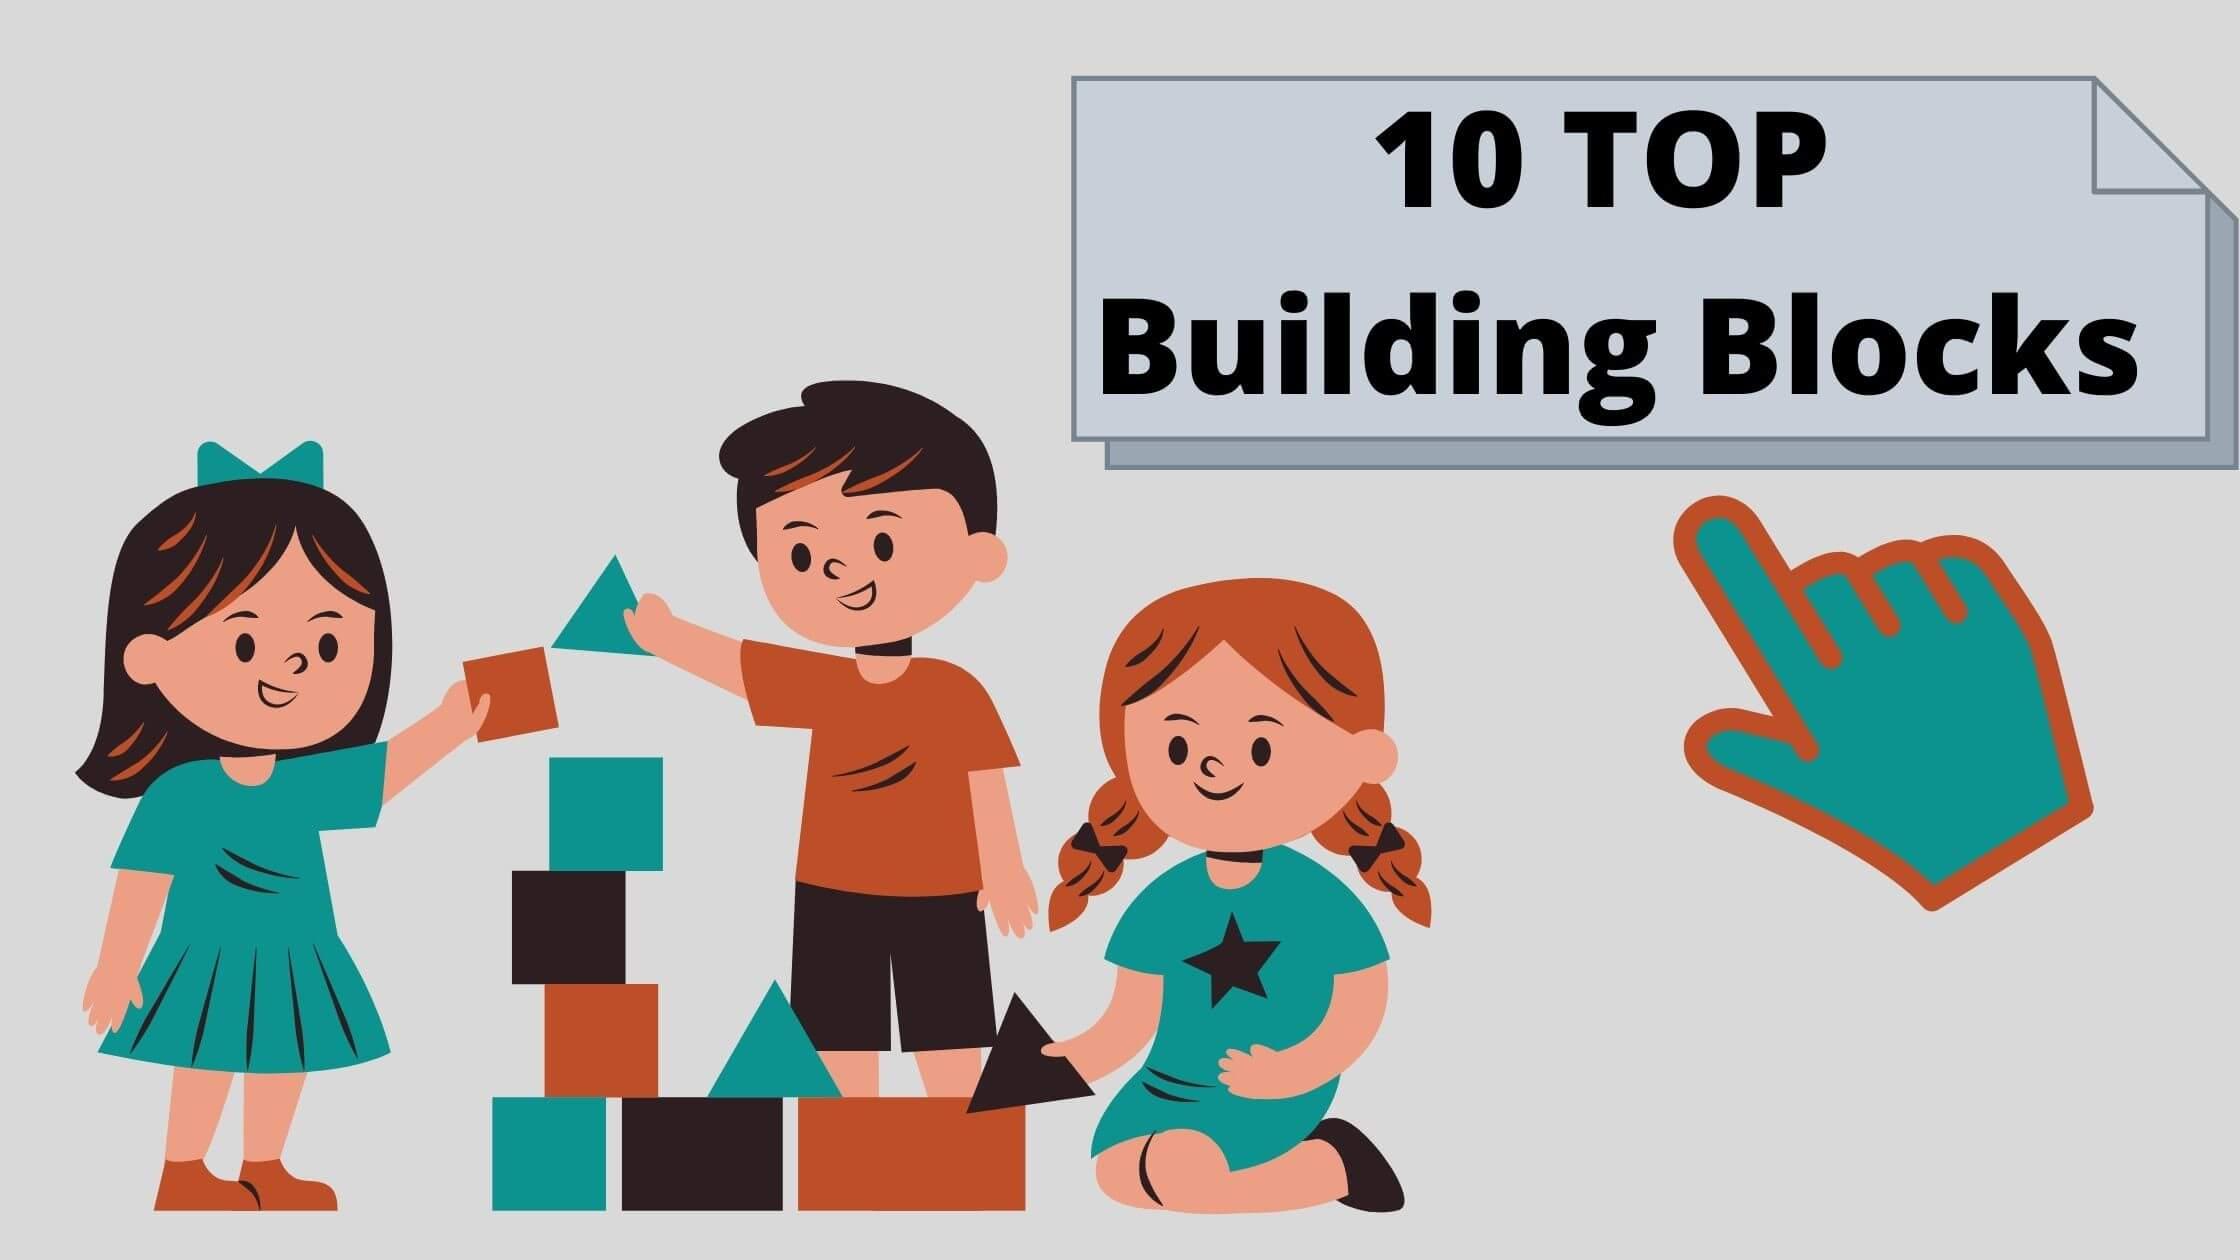 10 TOP Building Blocks